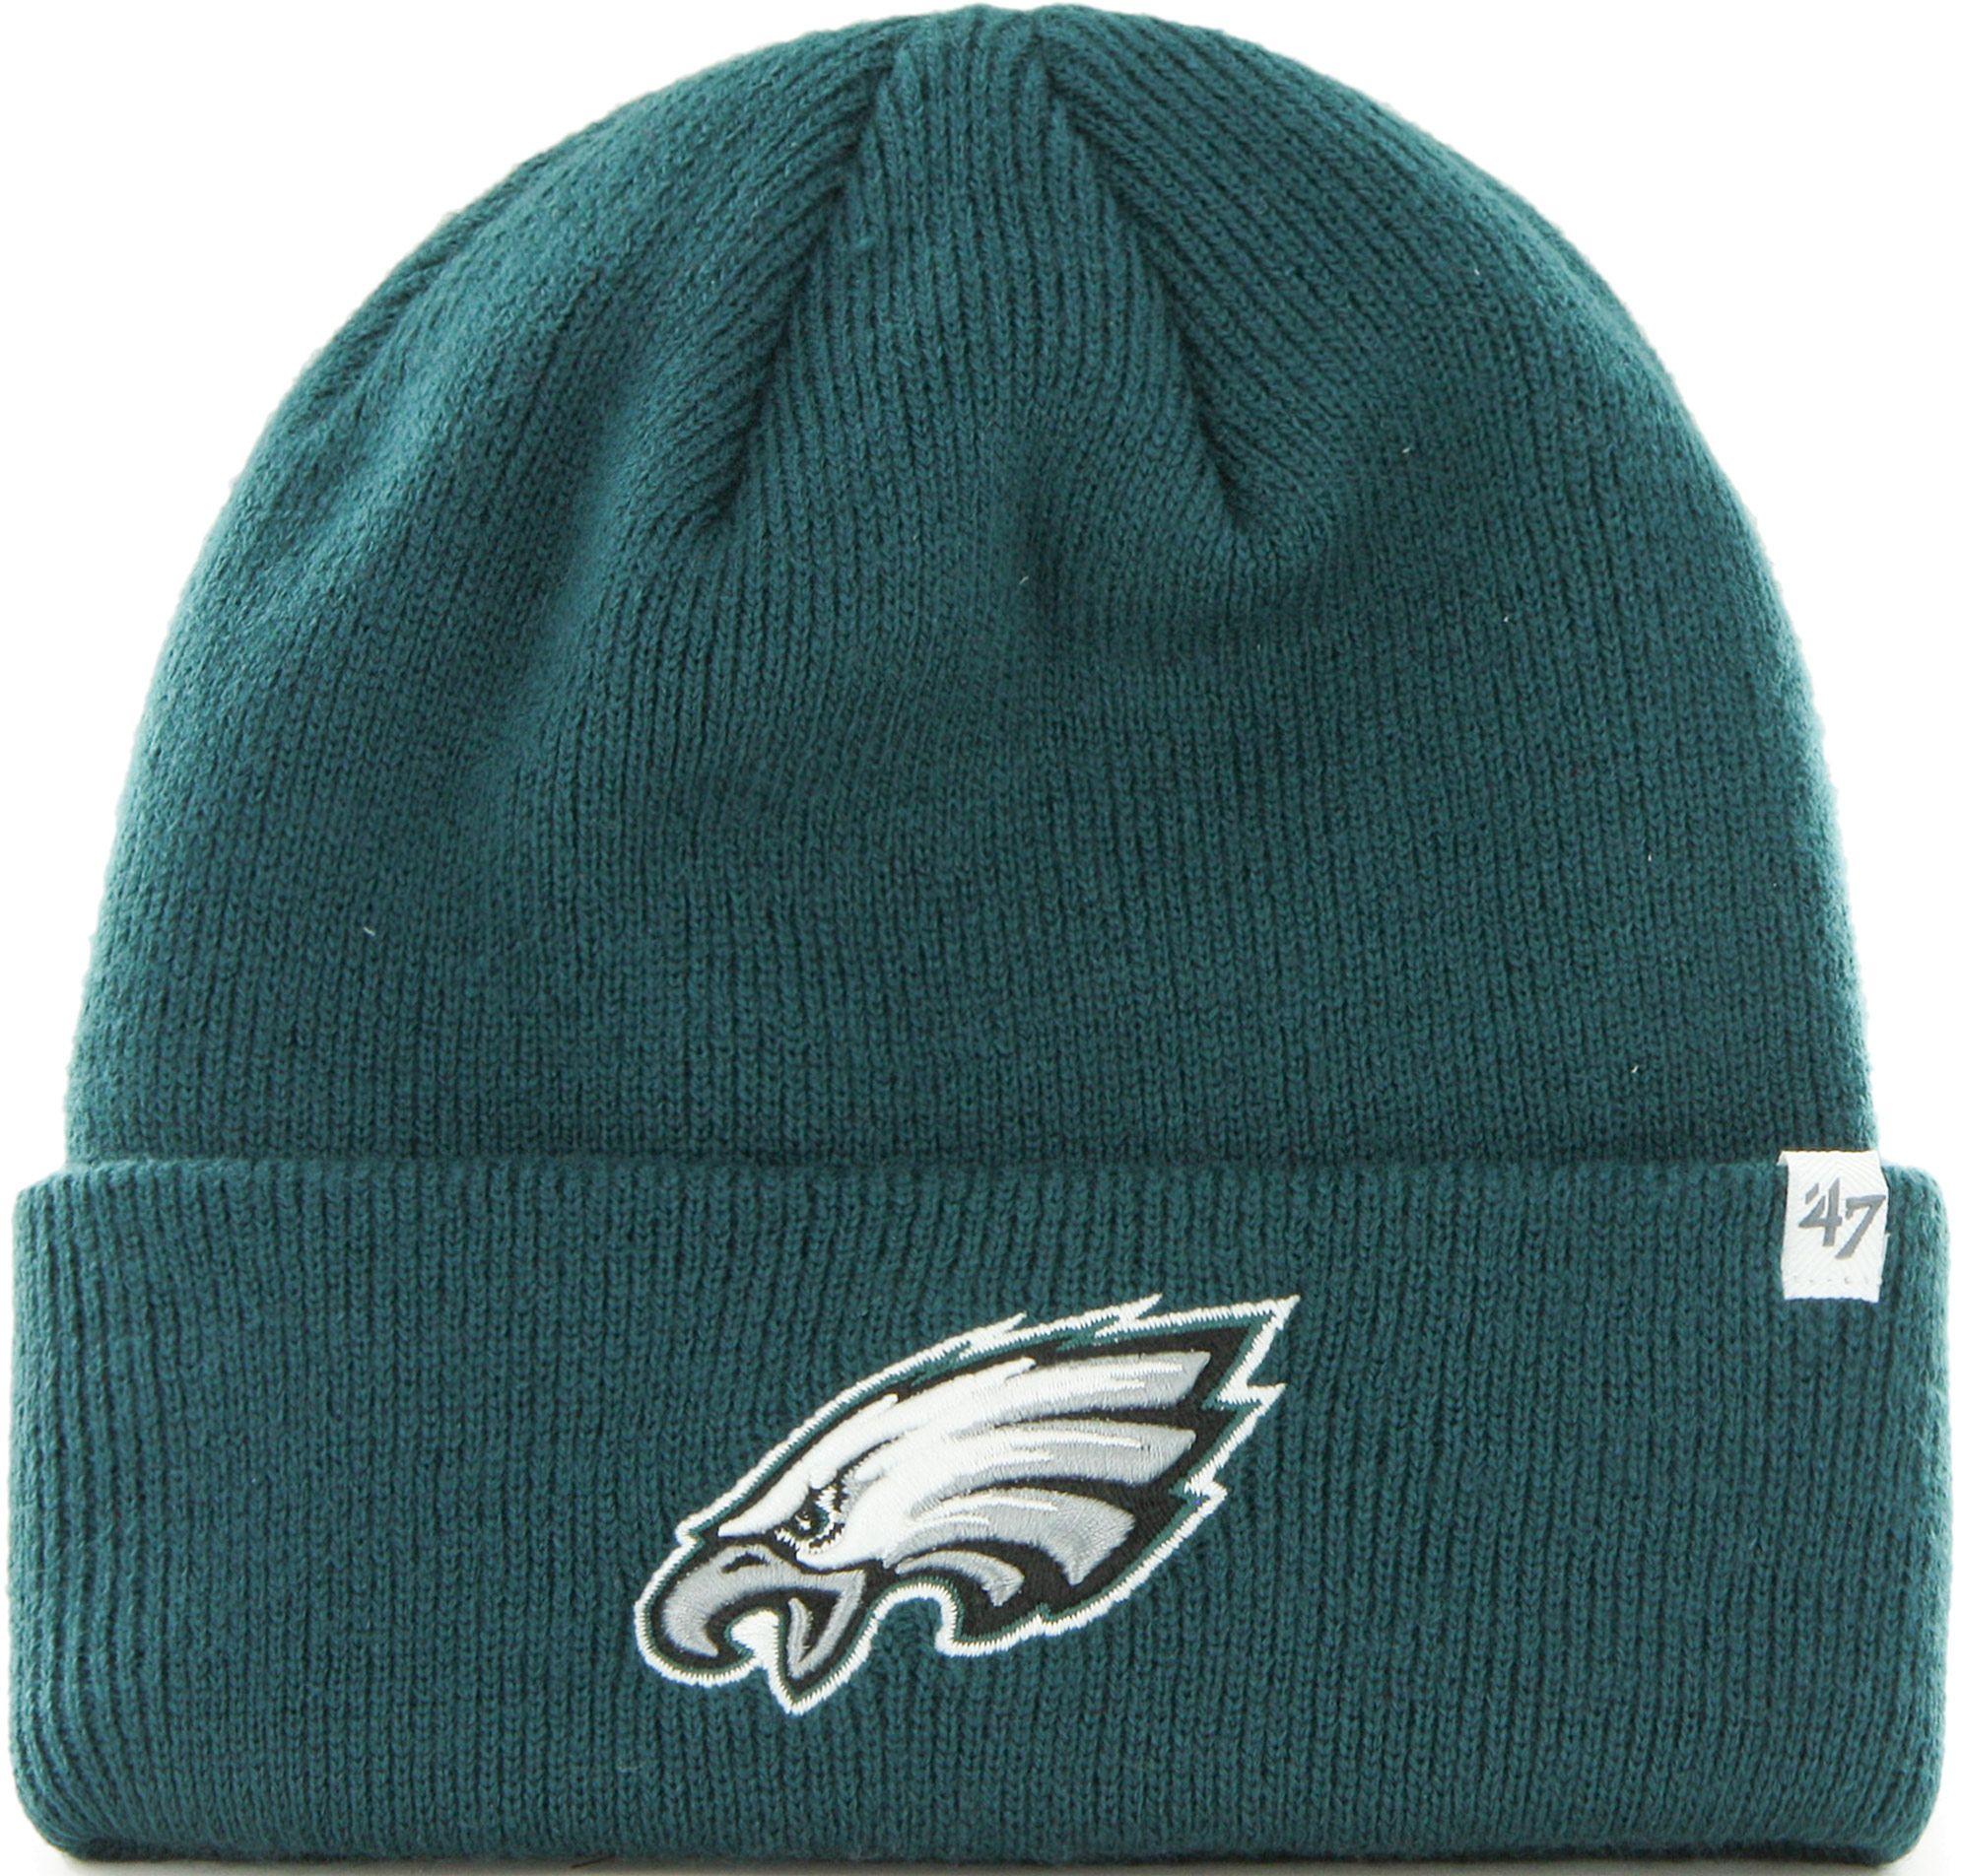 3624063f04614 ... czech 47 mens philadelphia eagles basic green cuffed knit beanie d8460  026bf